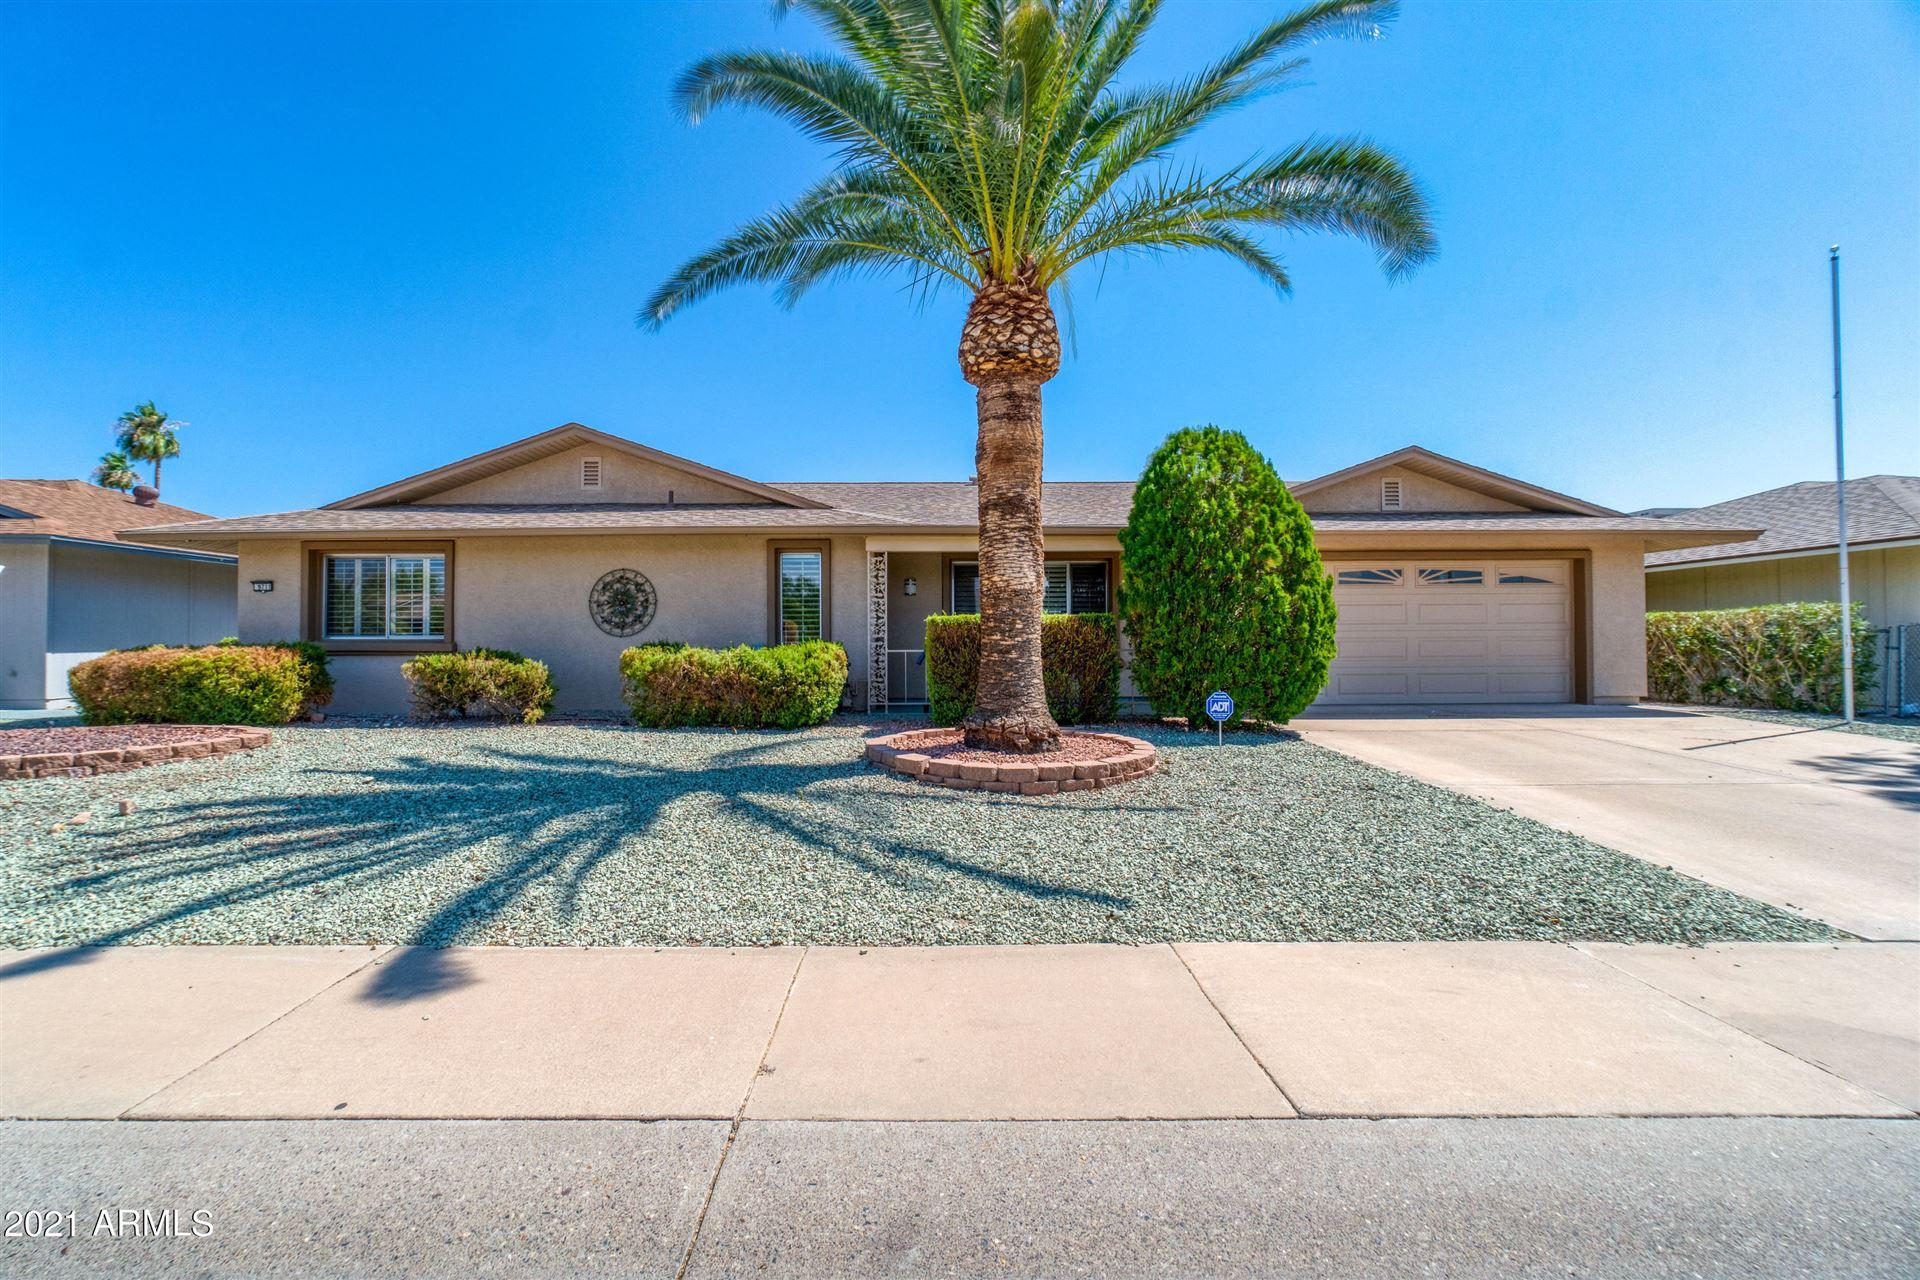 Photo of 9711 W WRANGLER Drive, Sun City, AZ 85373 (MLS # 6248750)